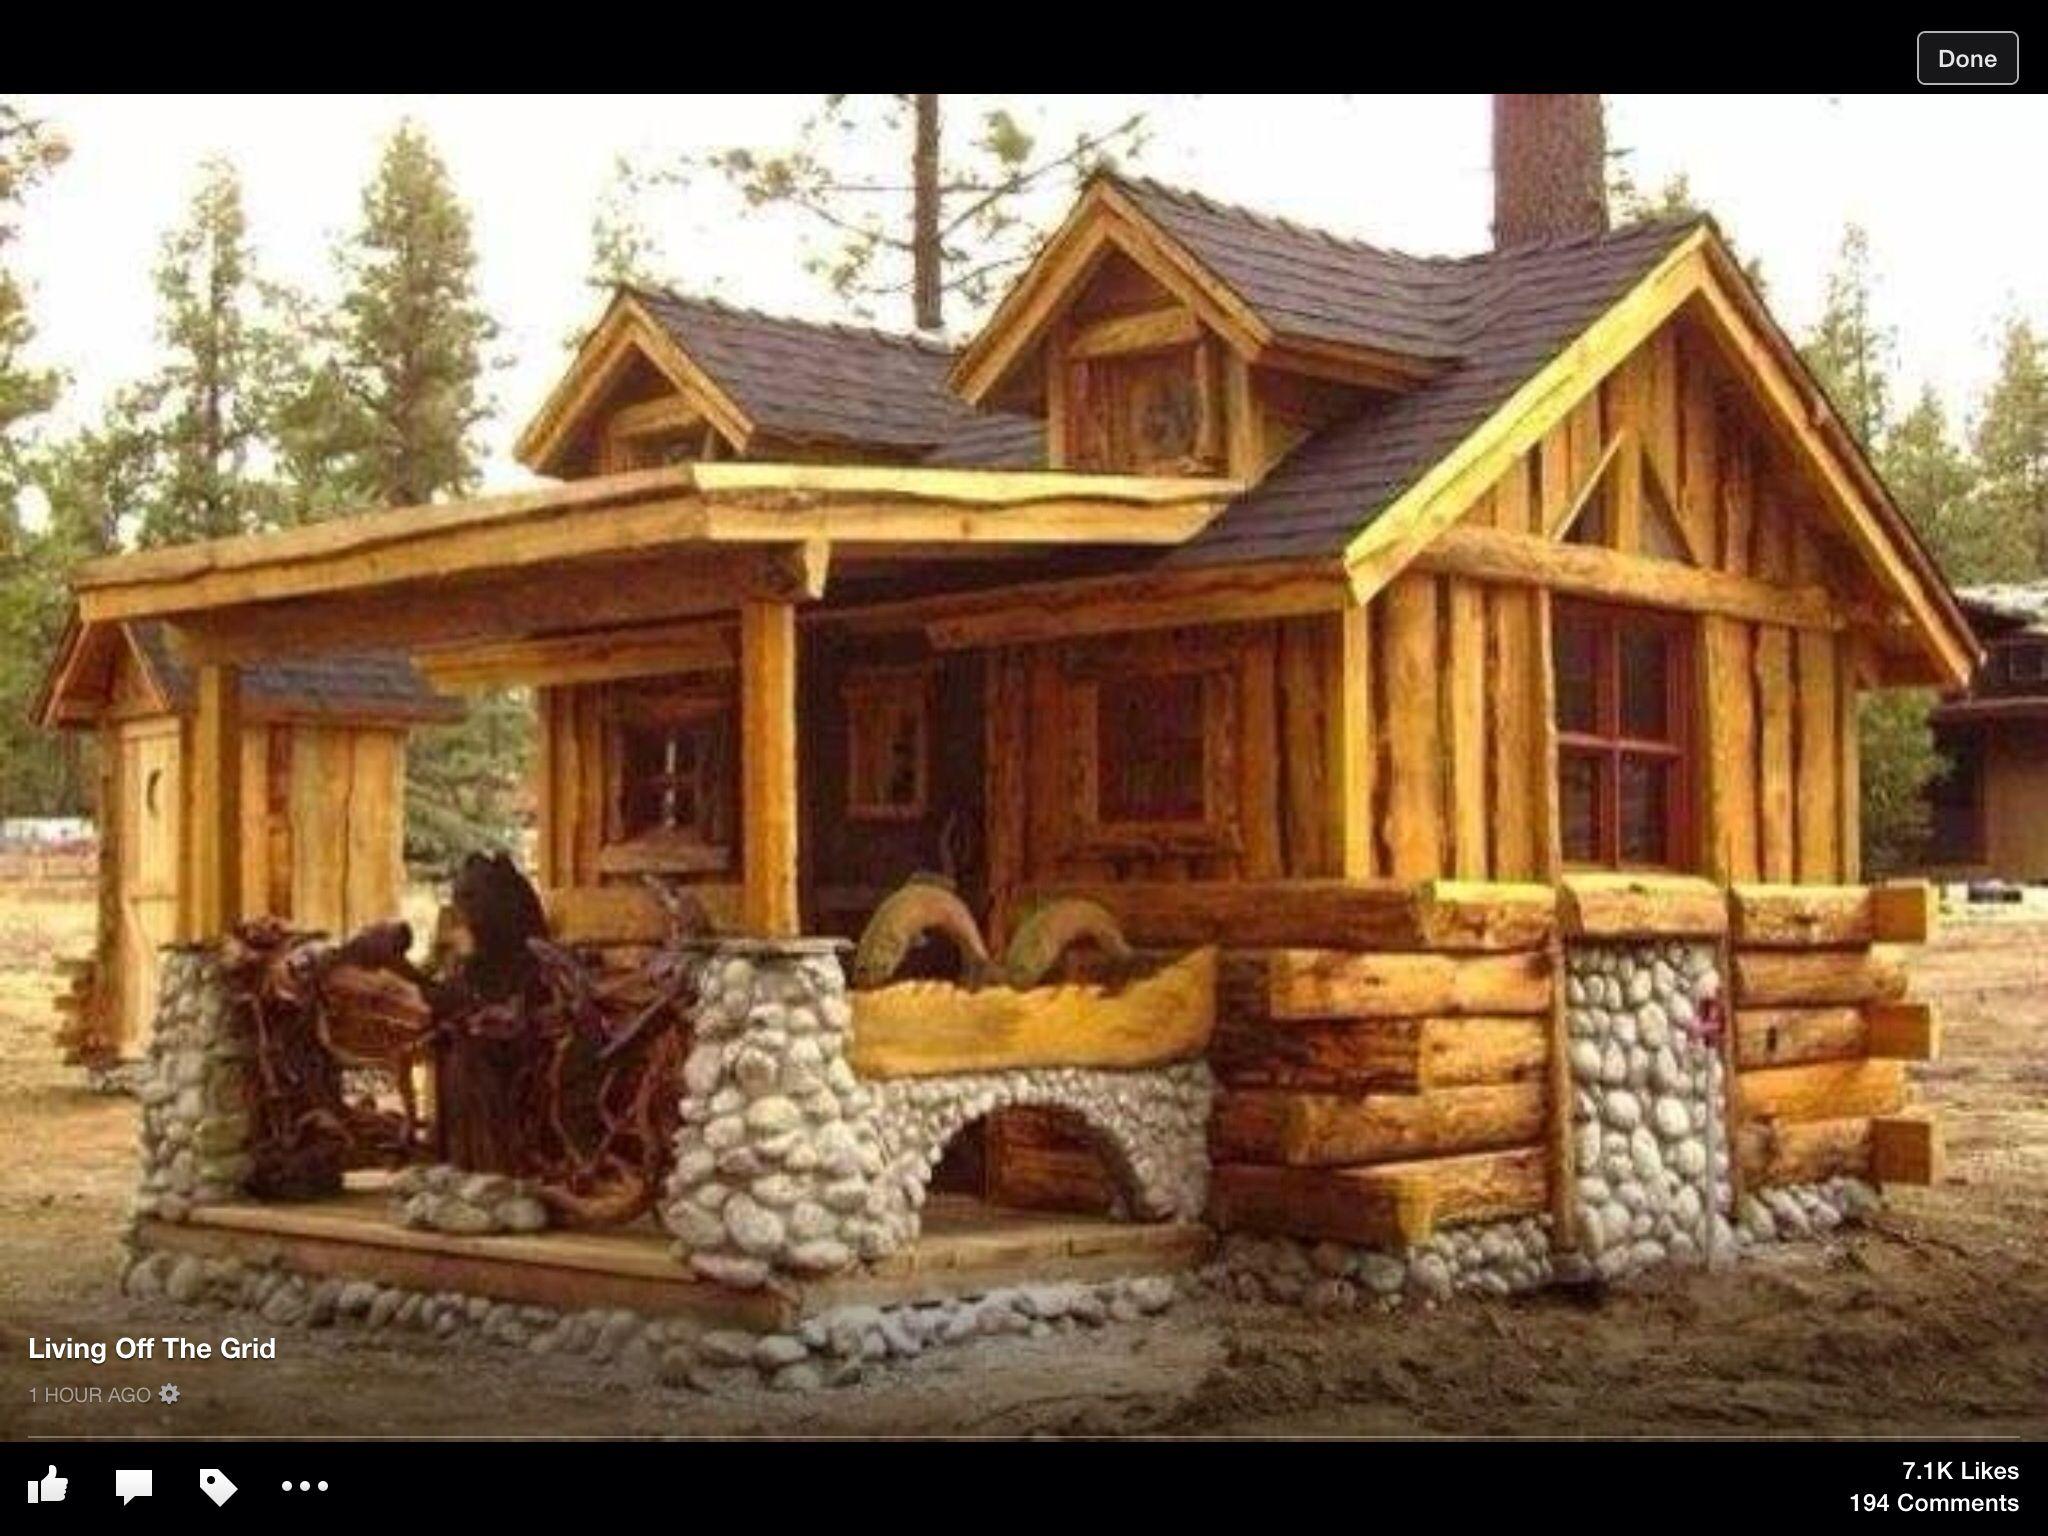 Exceptionnel Log Homes, Log Cabins, Chalets And Log Home Builders. DIY Log Cabin Kits U0026  Wholesale Log Homes.